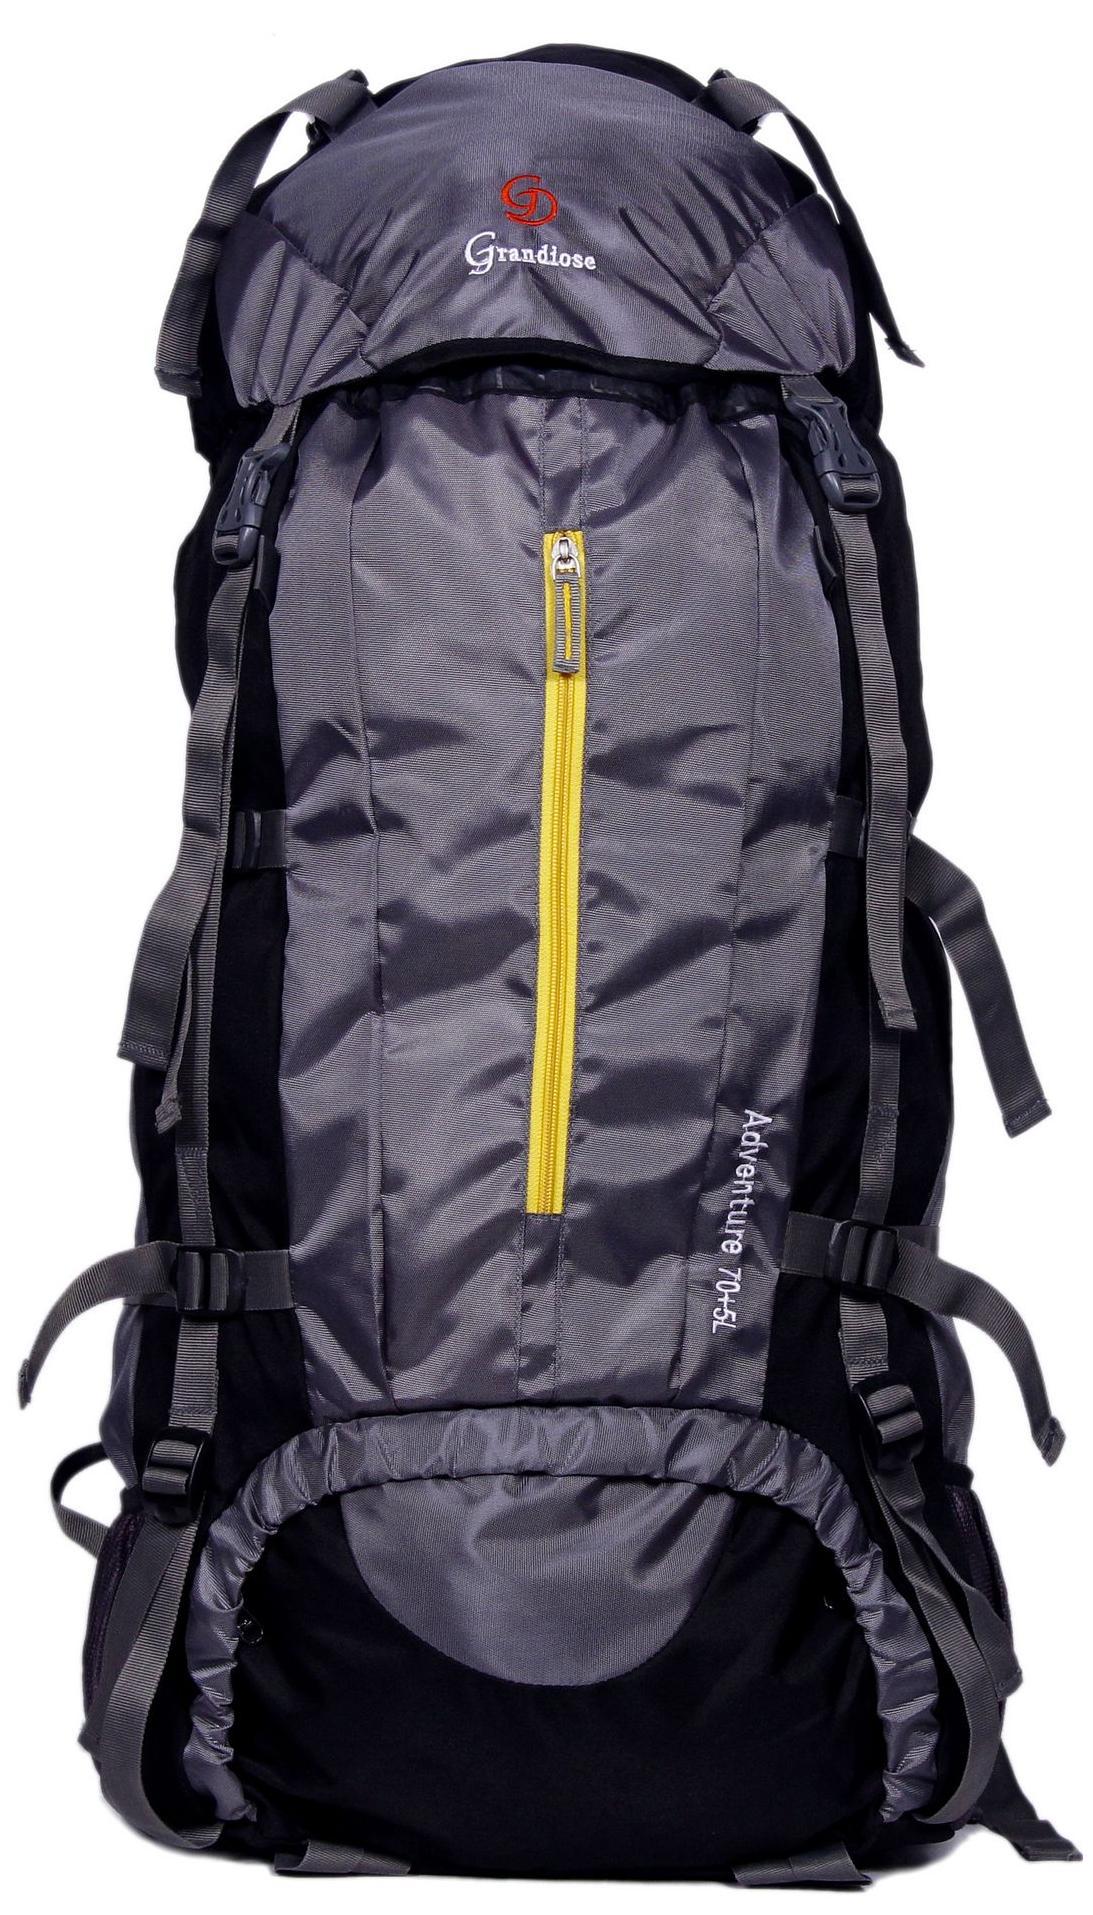 Grandiose 75L Grey Chain Model Hiking Trekking Camping Rucksack Backpack Bags (GTB67501GY)